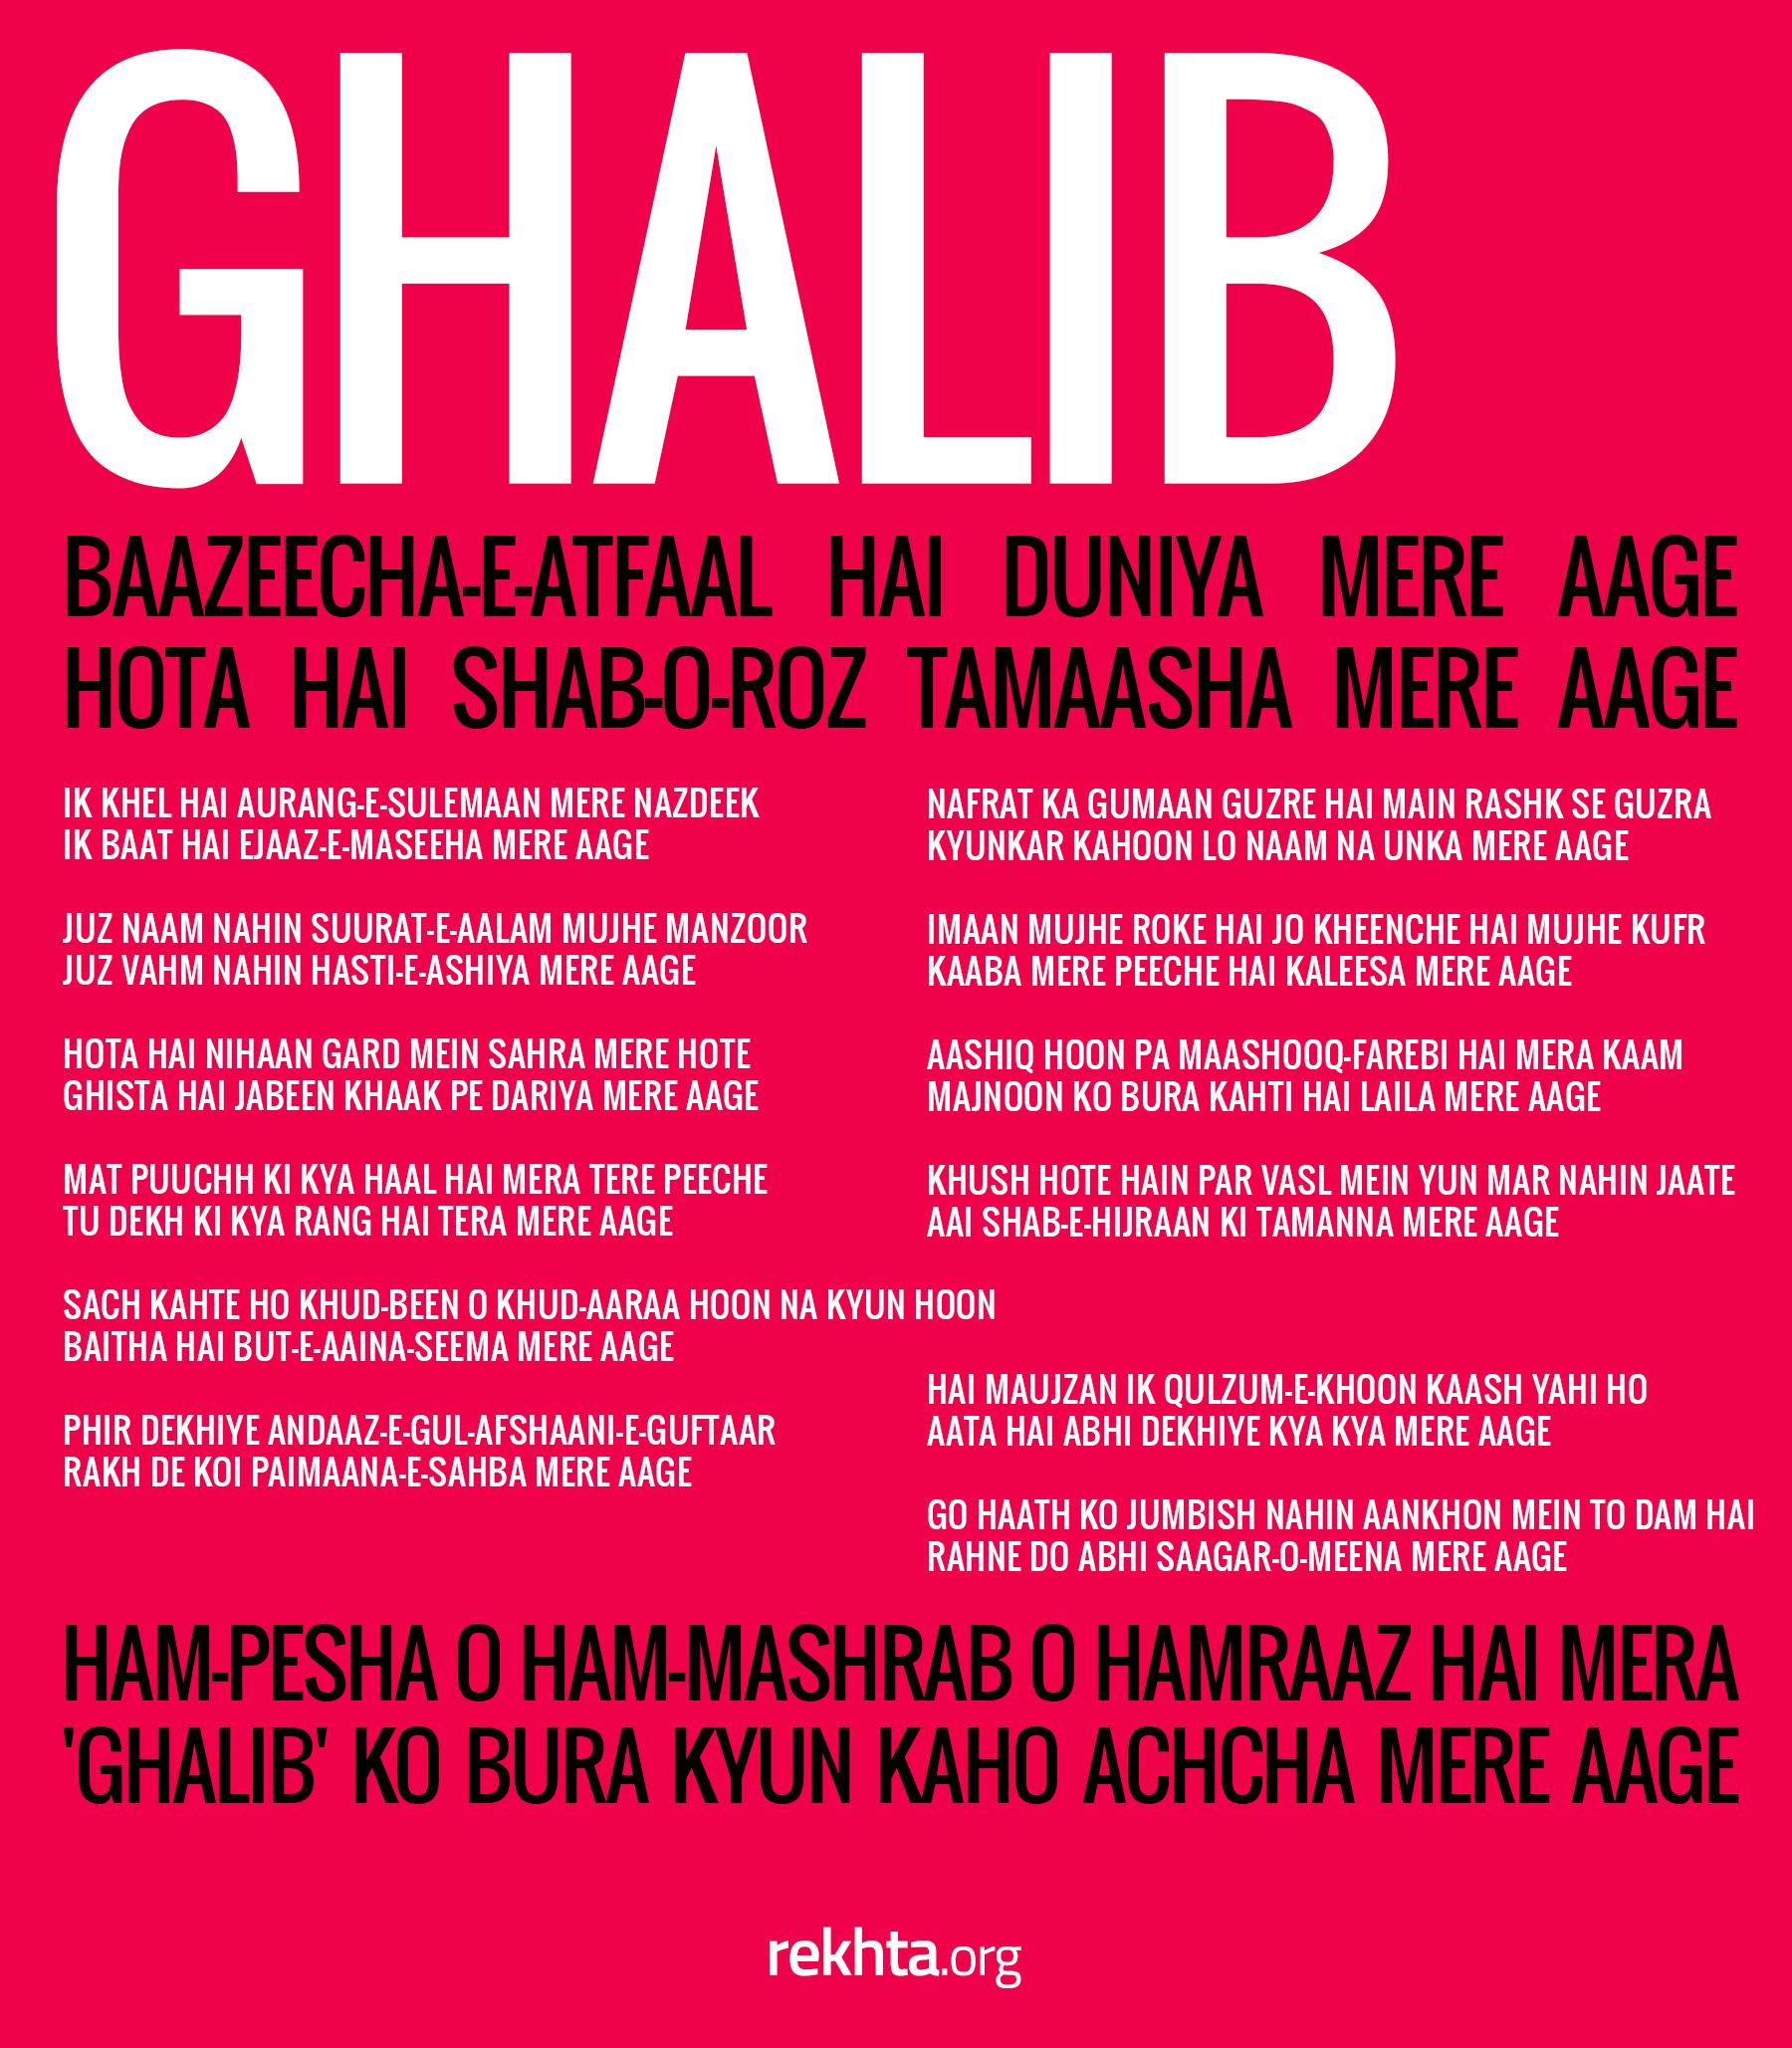 Mirza Ghalib | Mirza ghalib, Mirza ghalib quotes